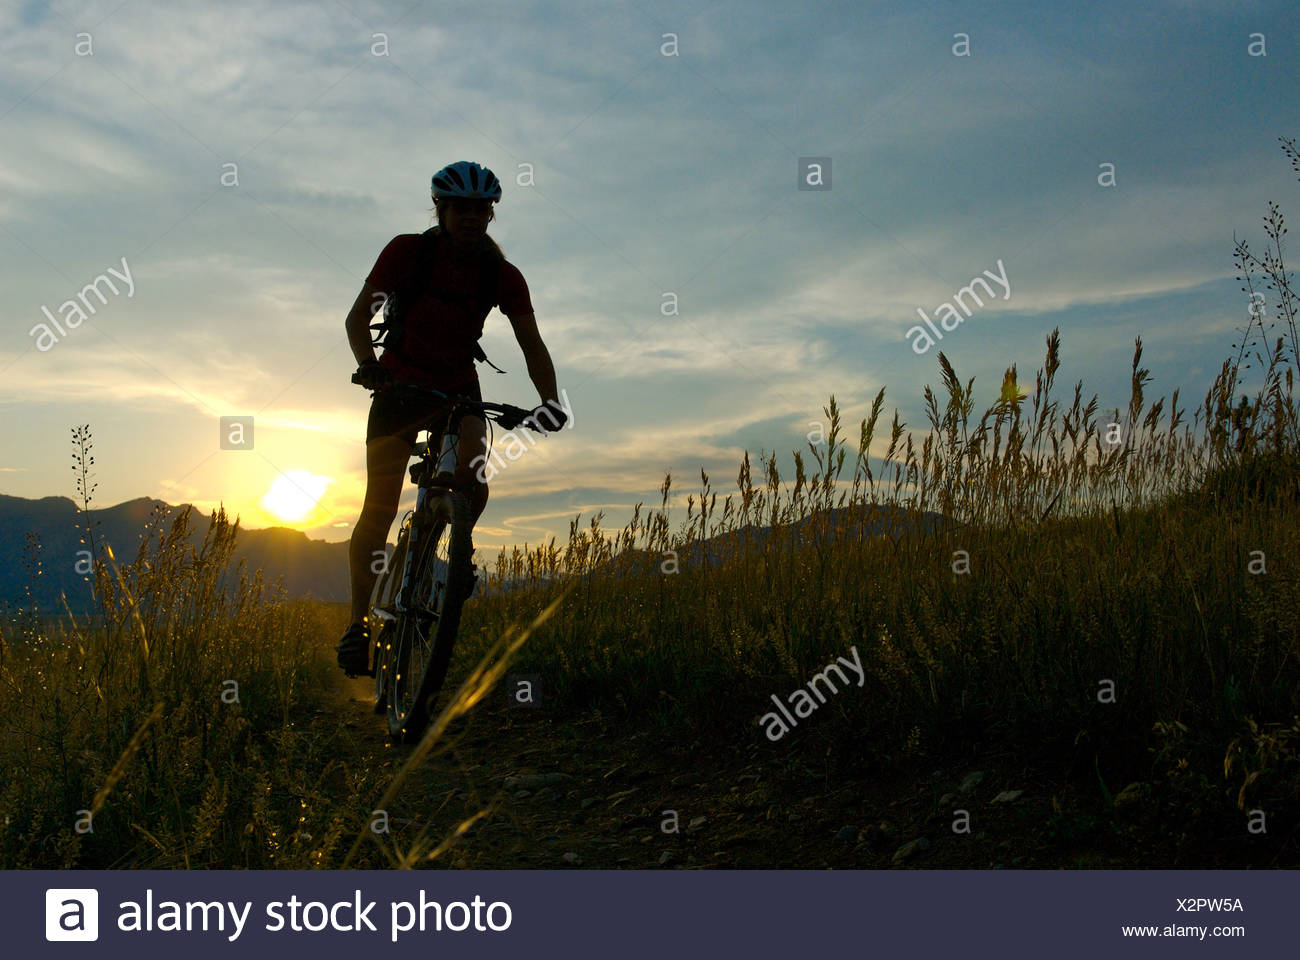 A female mountain biking at Marshal Mesa, Colorado (back lite). - Stock Image